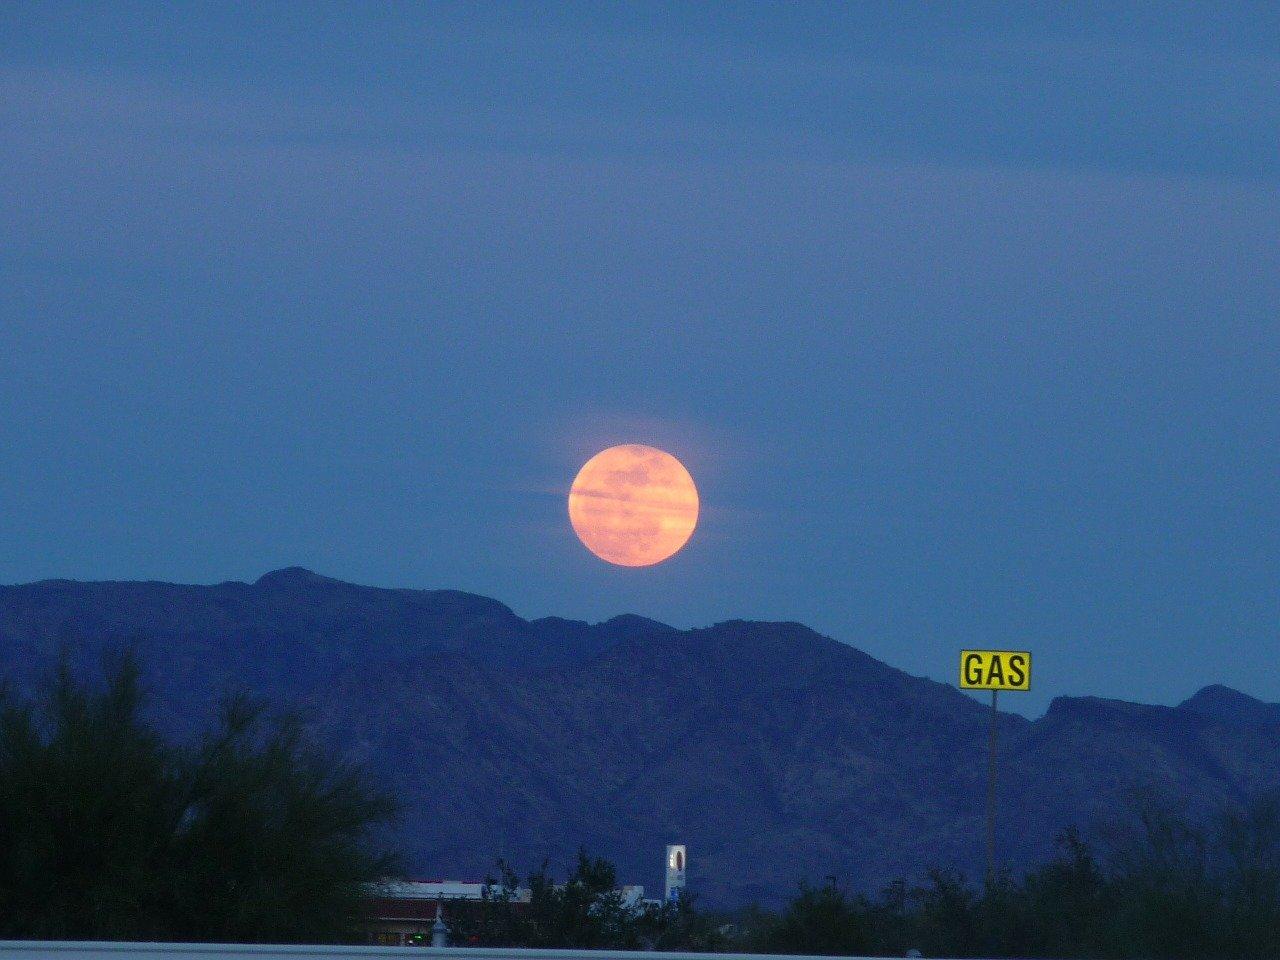 Eclipse de Súperluna AZUL de Sangre para este 31 de Enero 3